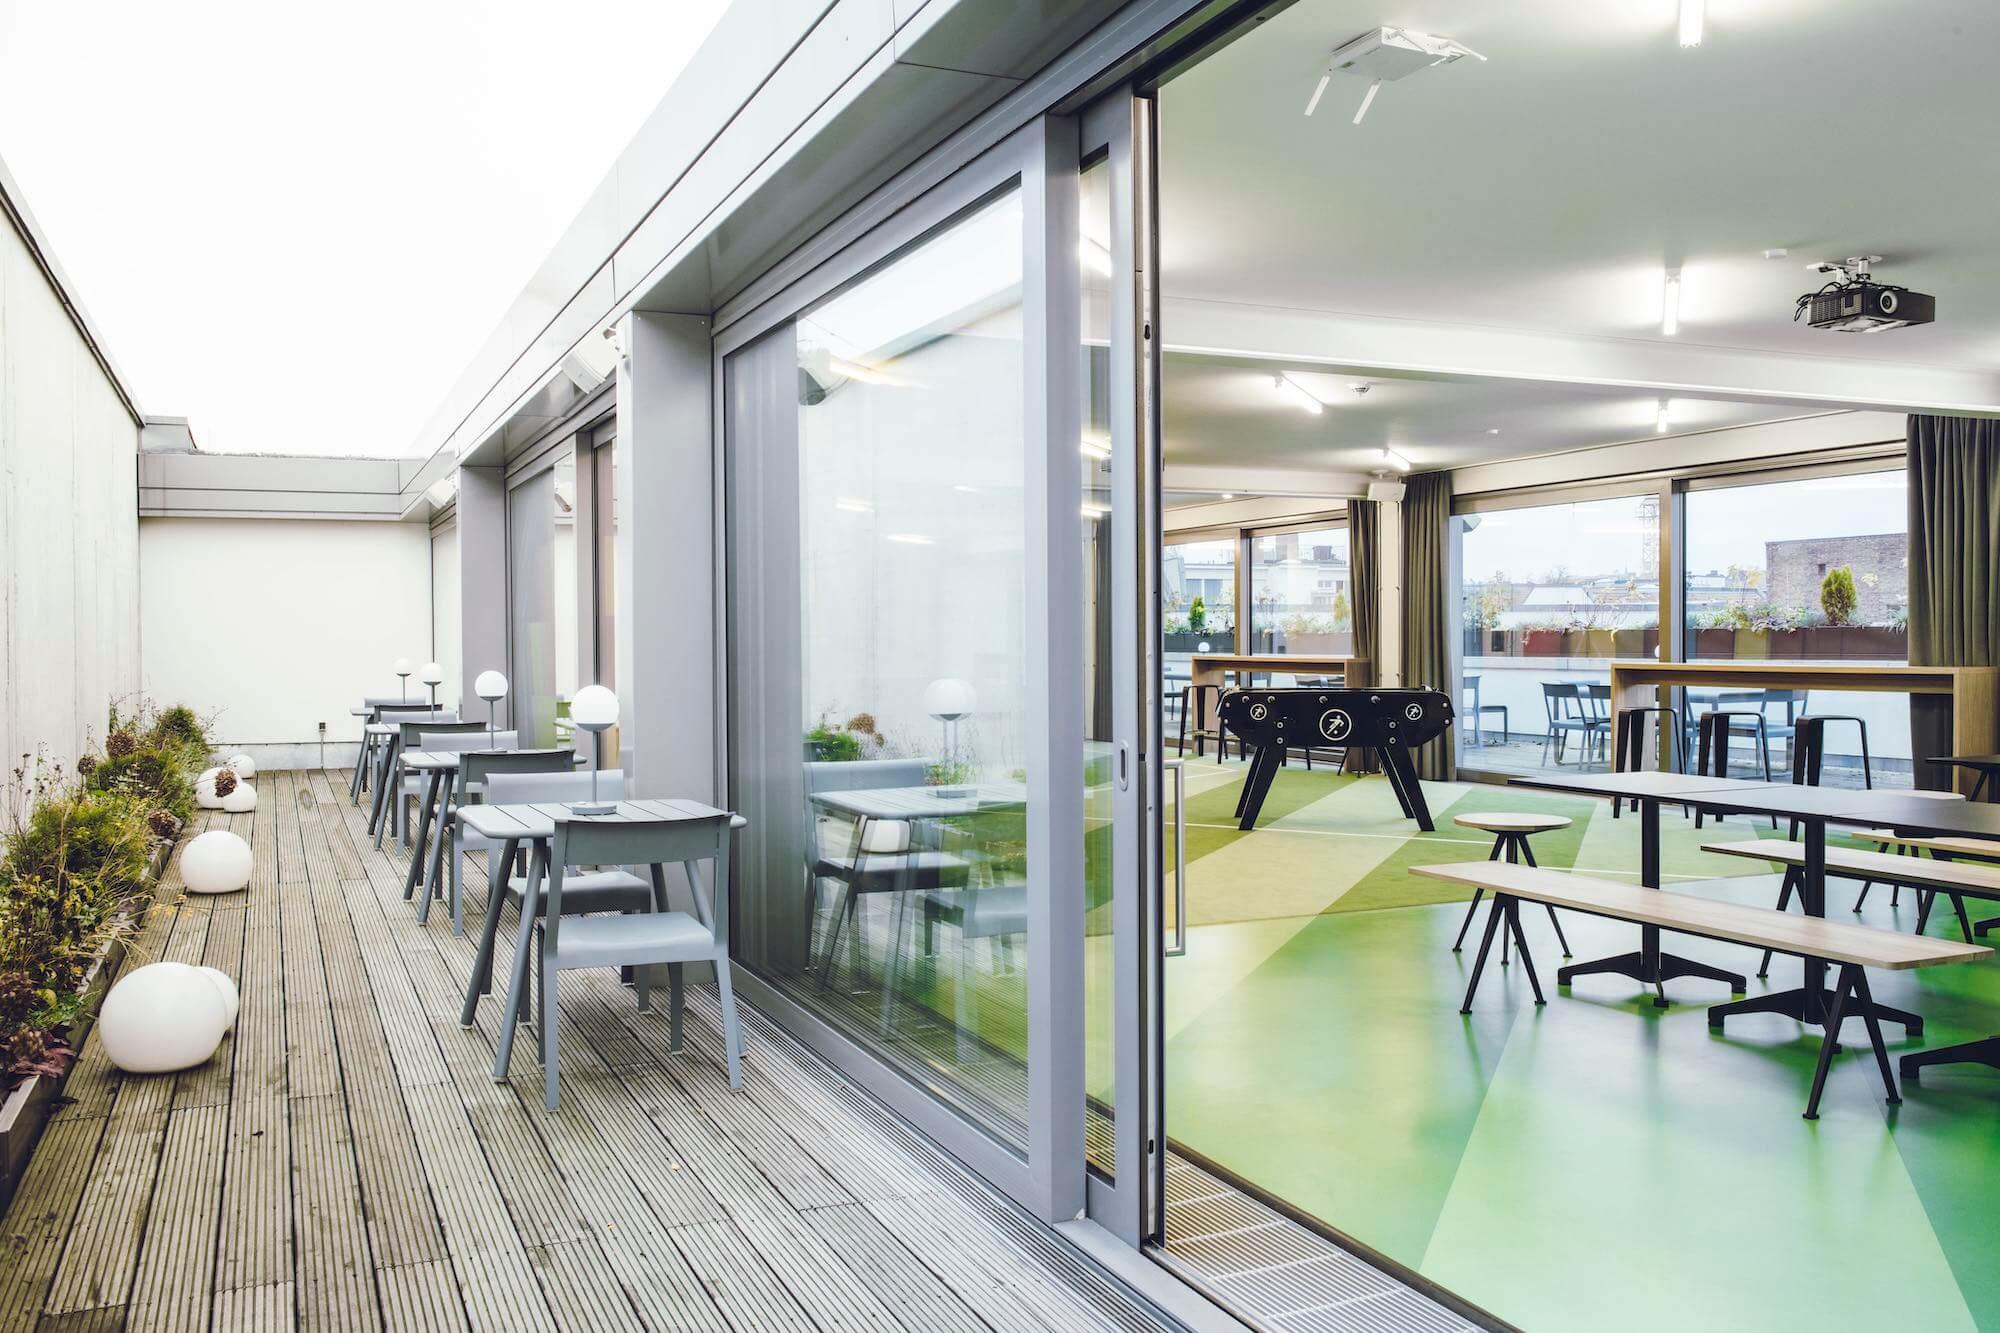 Onefootball Startup Büro TKEZ Architekten Eventfläche New Work